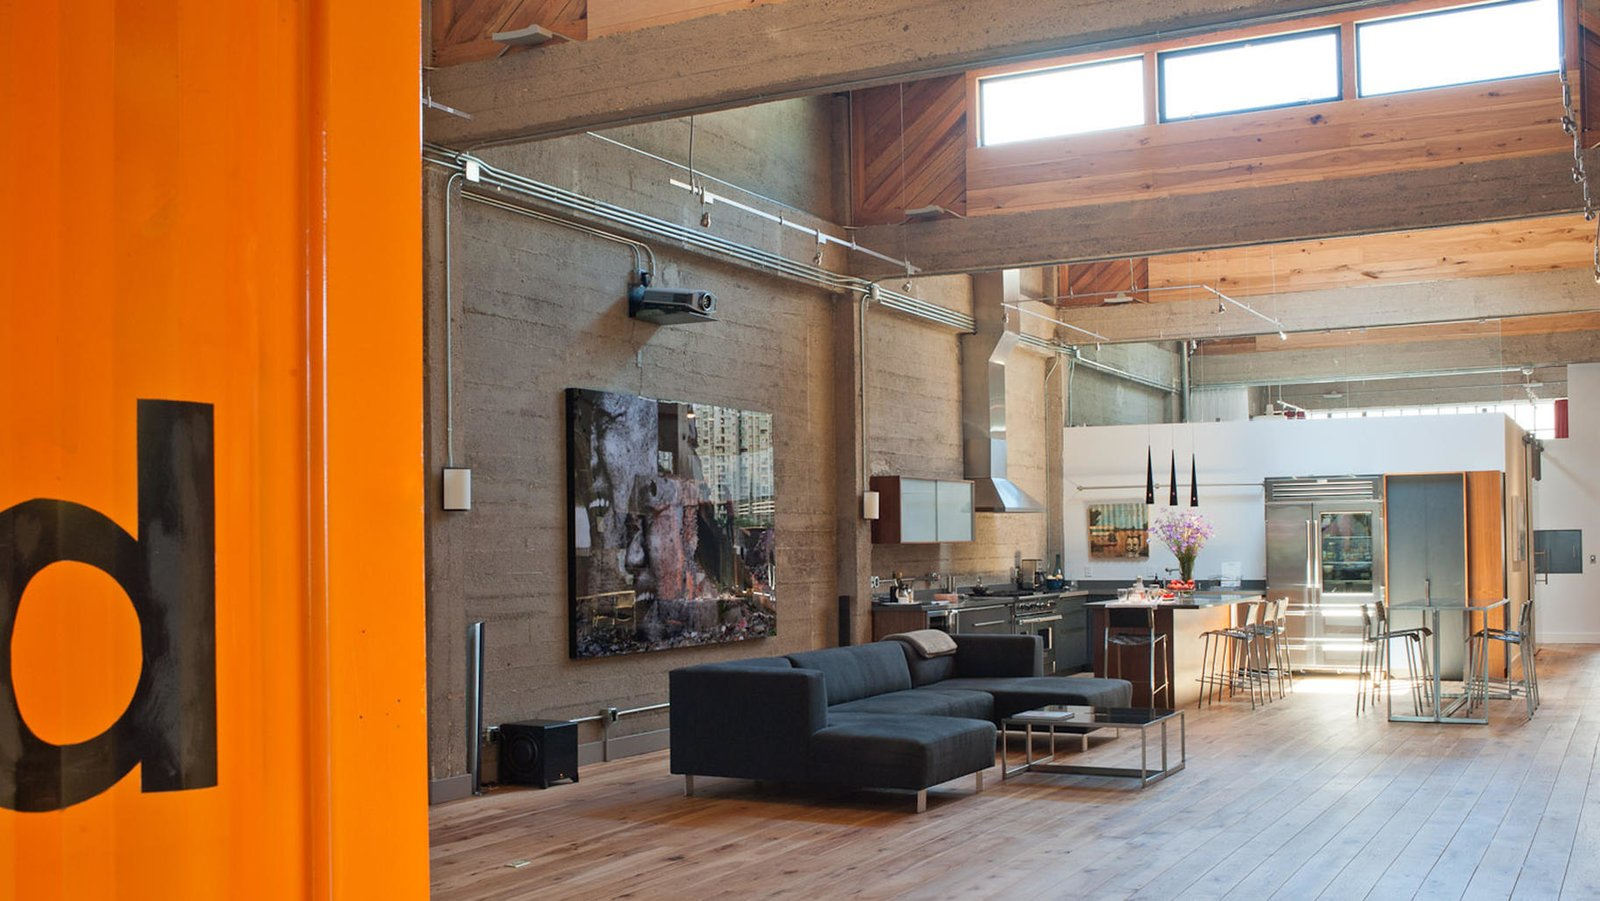 #lundberg #lundbergdesign #sanfrancisco #windows #glass #concrete #warehouse #interior #livingroom #hardwoodfloors #flooring #kitchen   20+ Modern Warehouse and Garages Conversions by Zachary Edelson from Wardell Sagan Residence